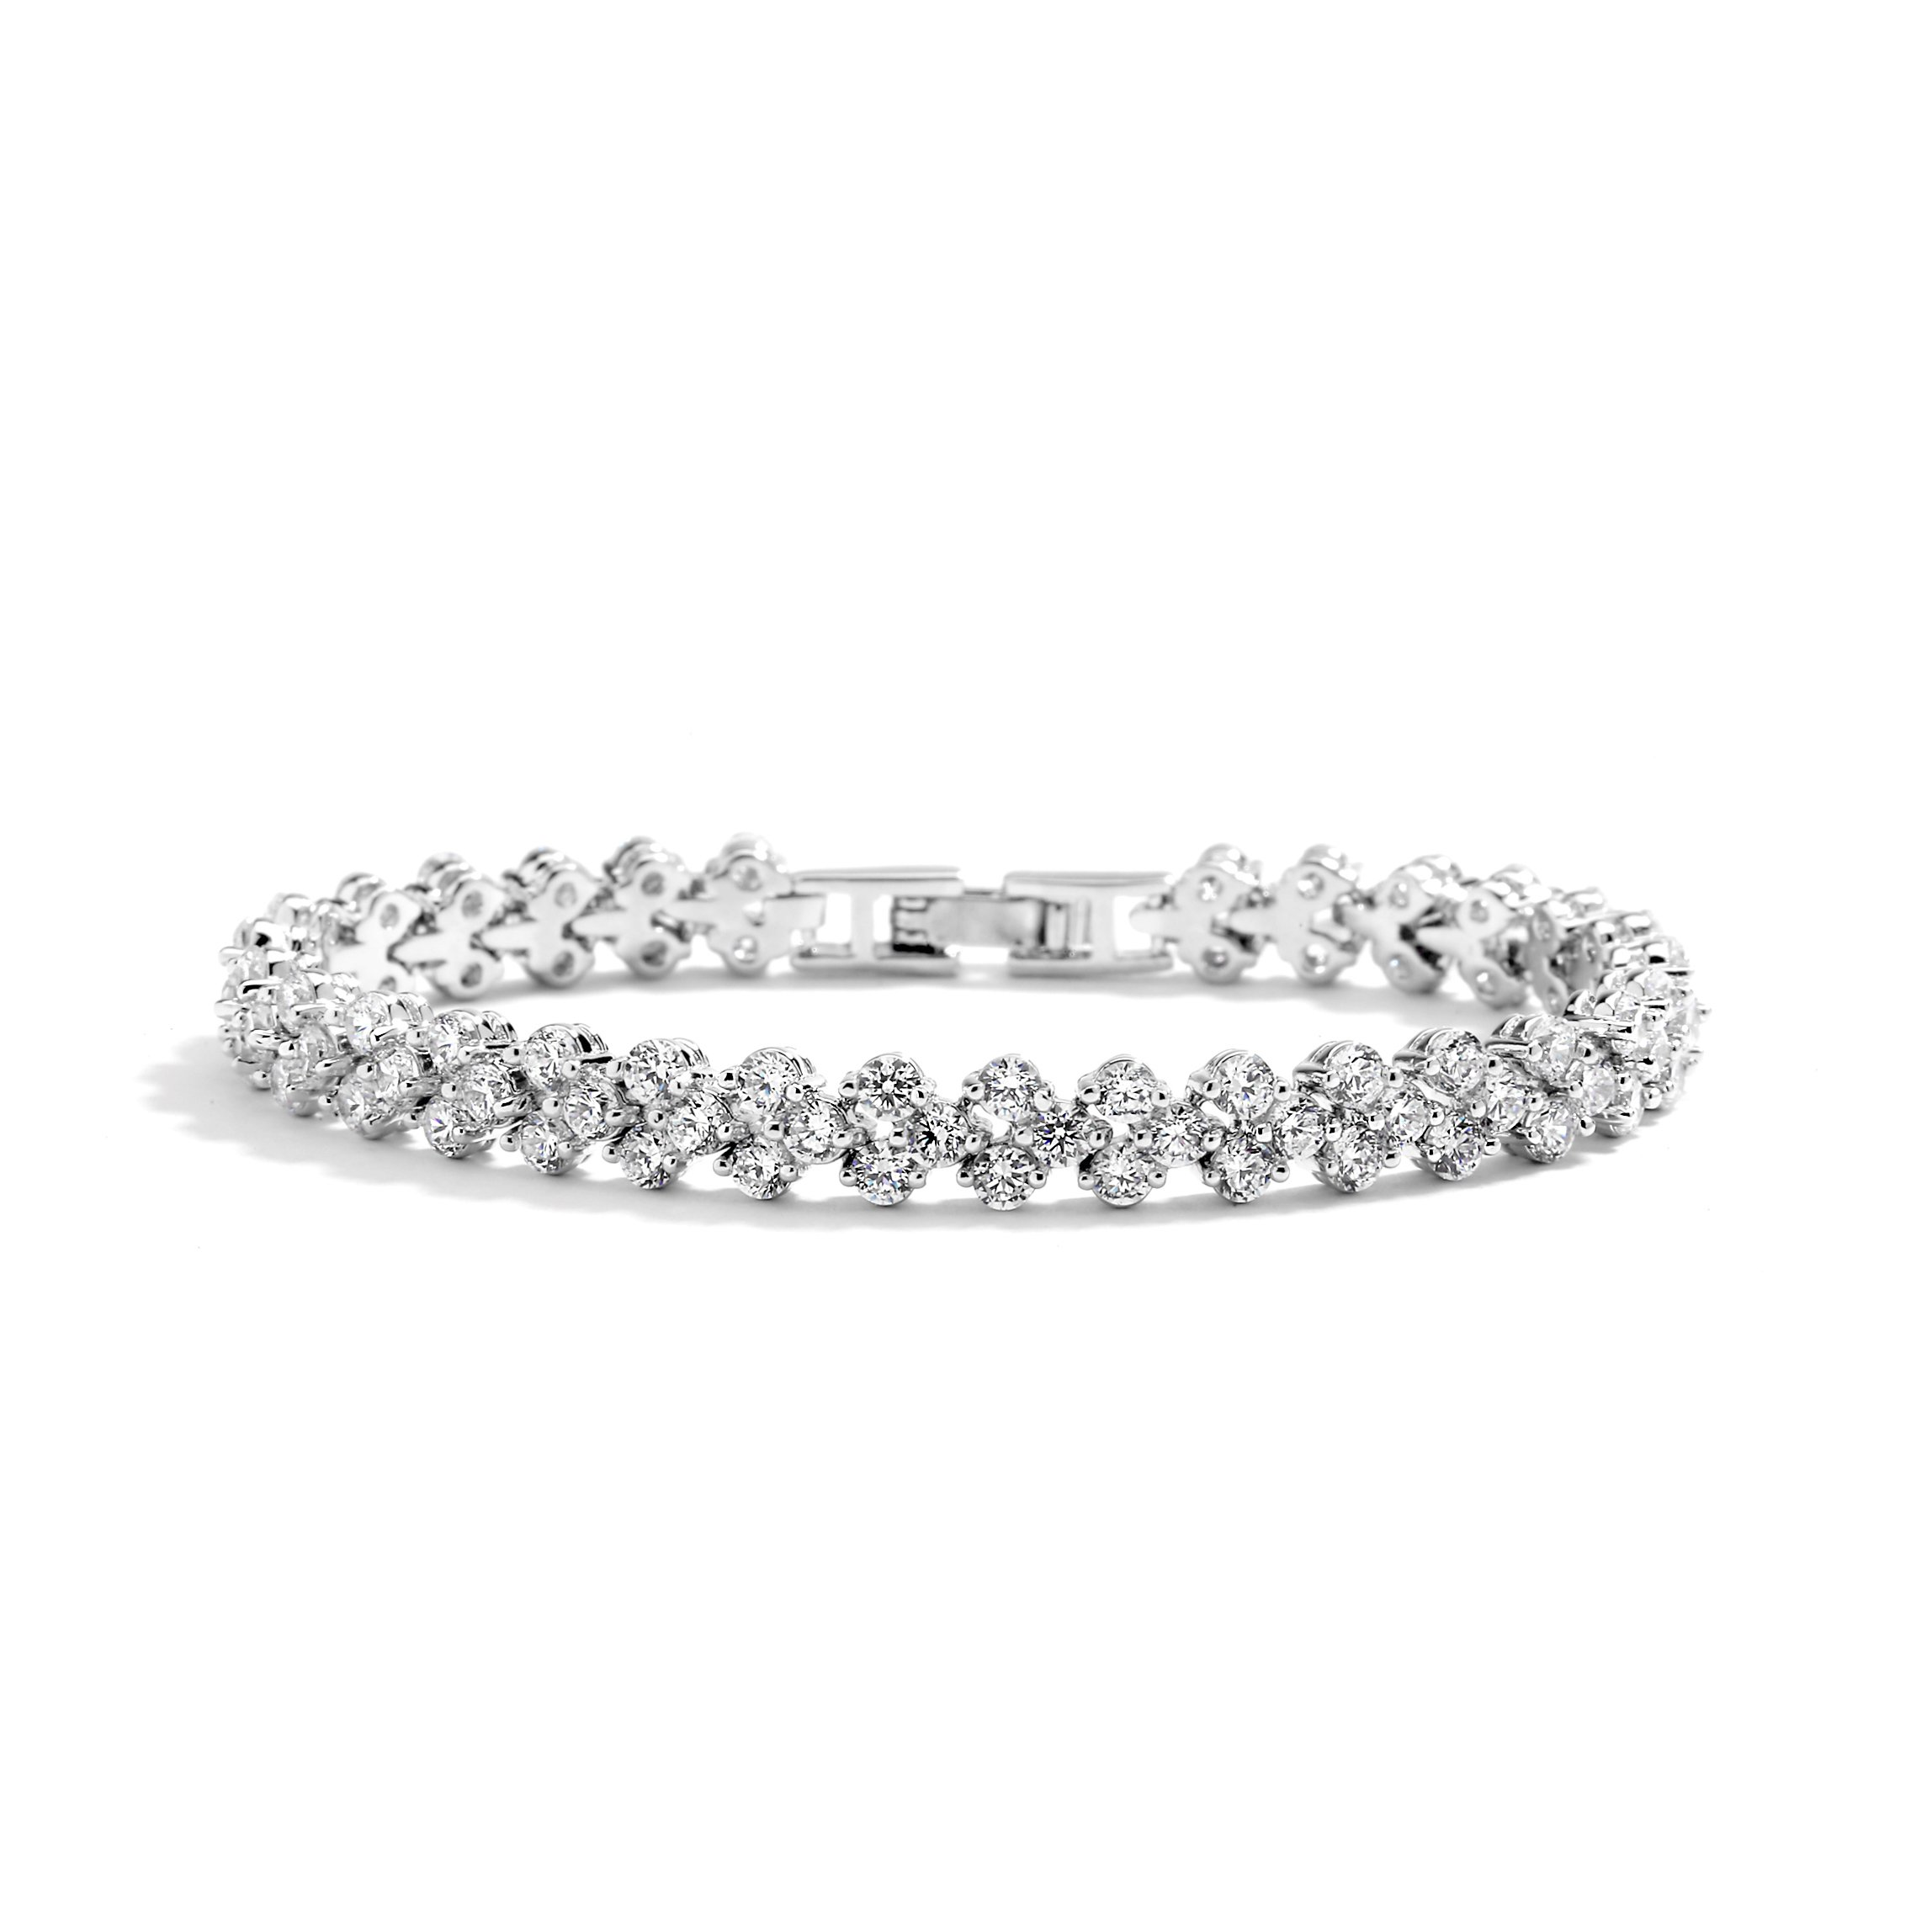 Mariell Rhodium Cubic Zirconia Wedding or Prom Tennis Bracelet for Bridal or Everyday Wear!